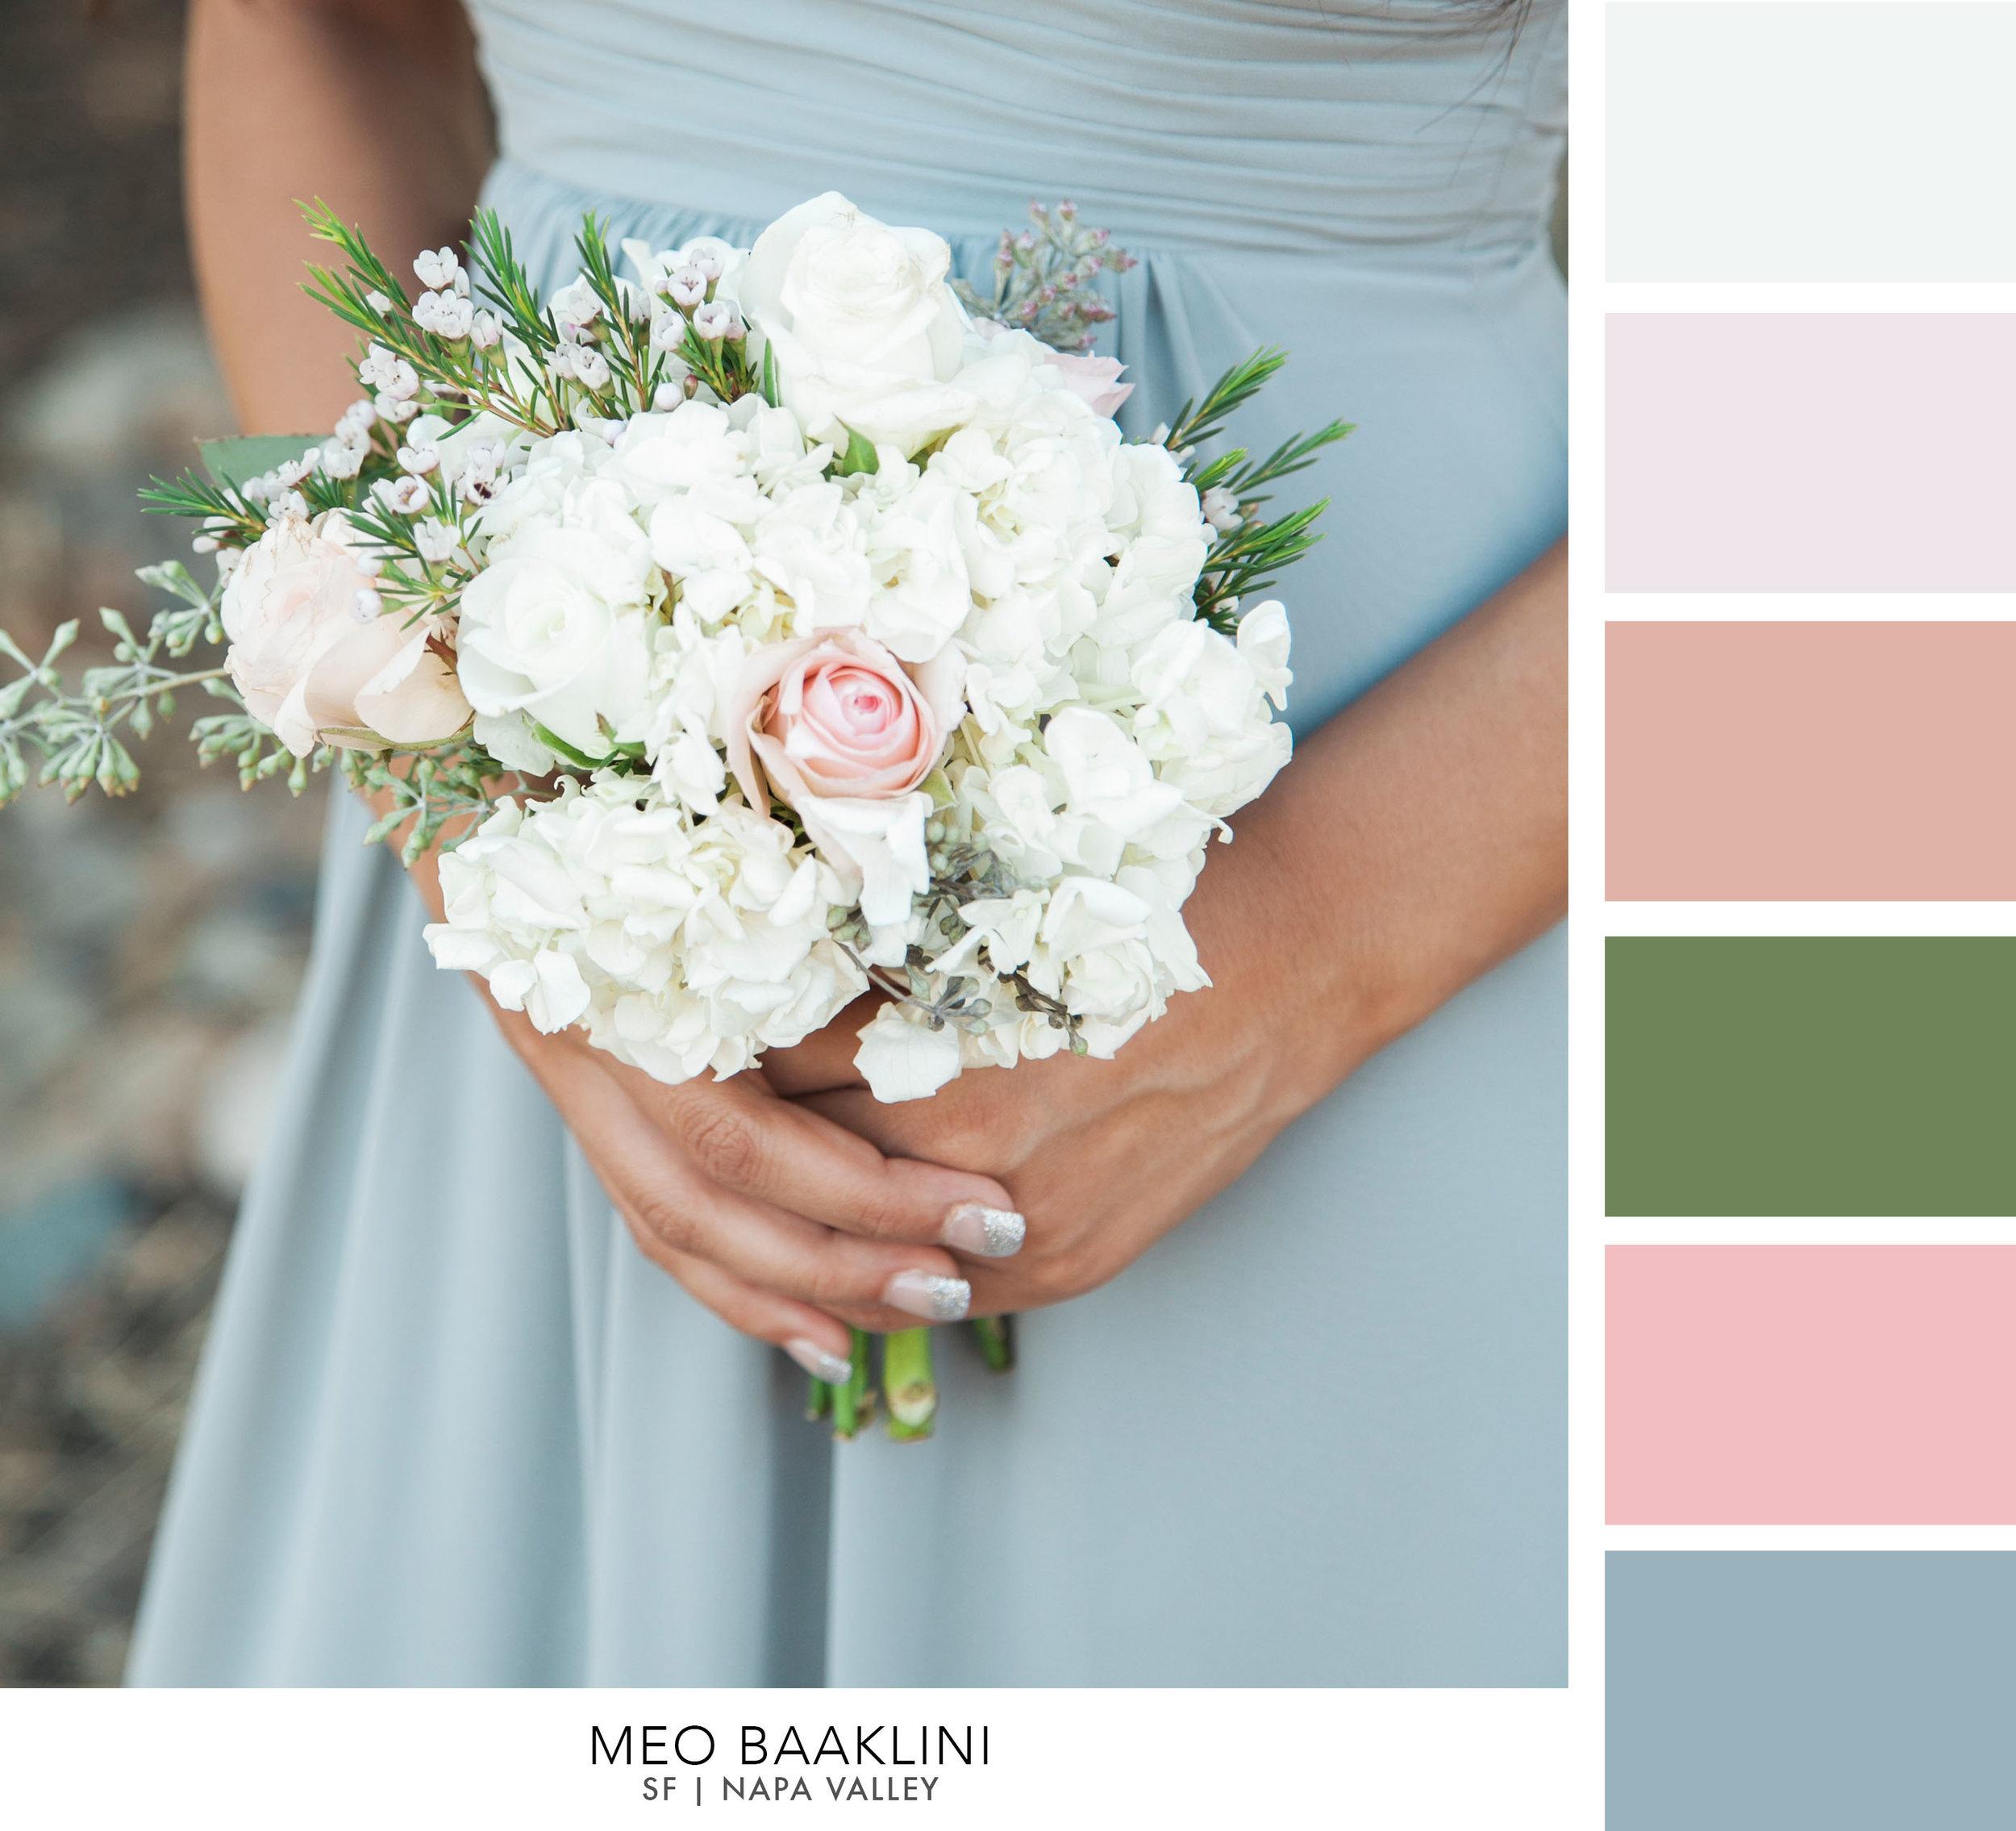 AWedding_Bouquet_Color_Palette_Inspiration_201631.jpg